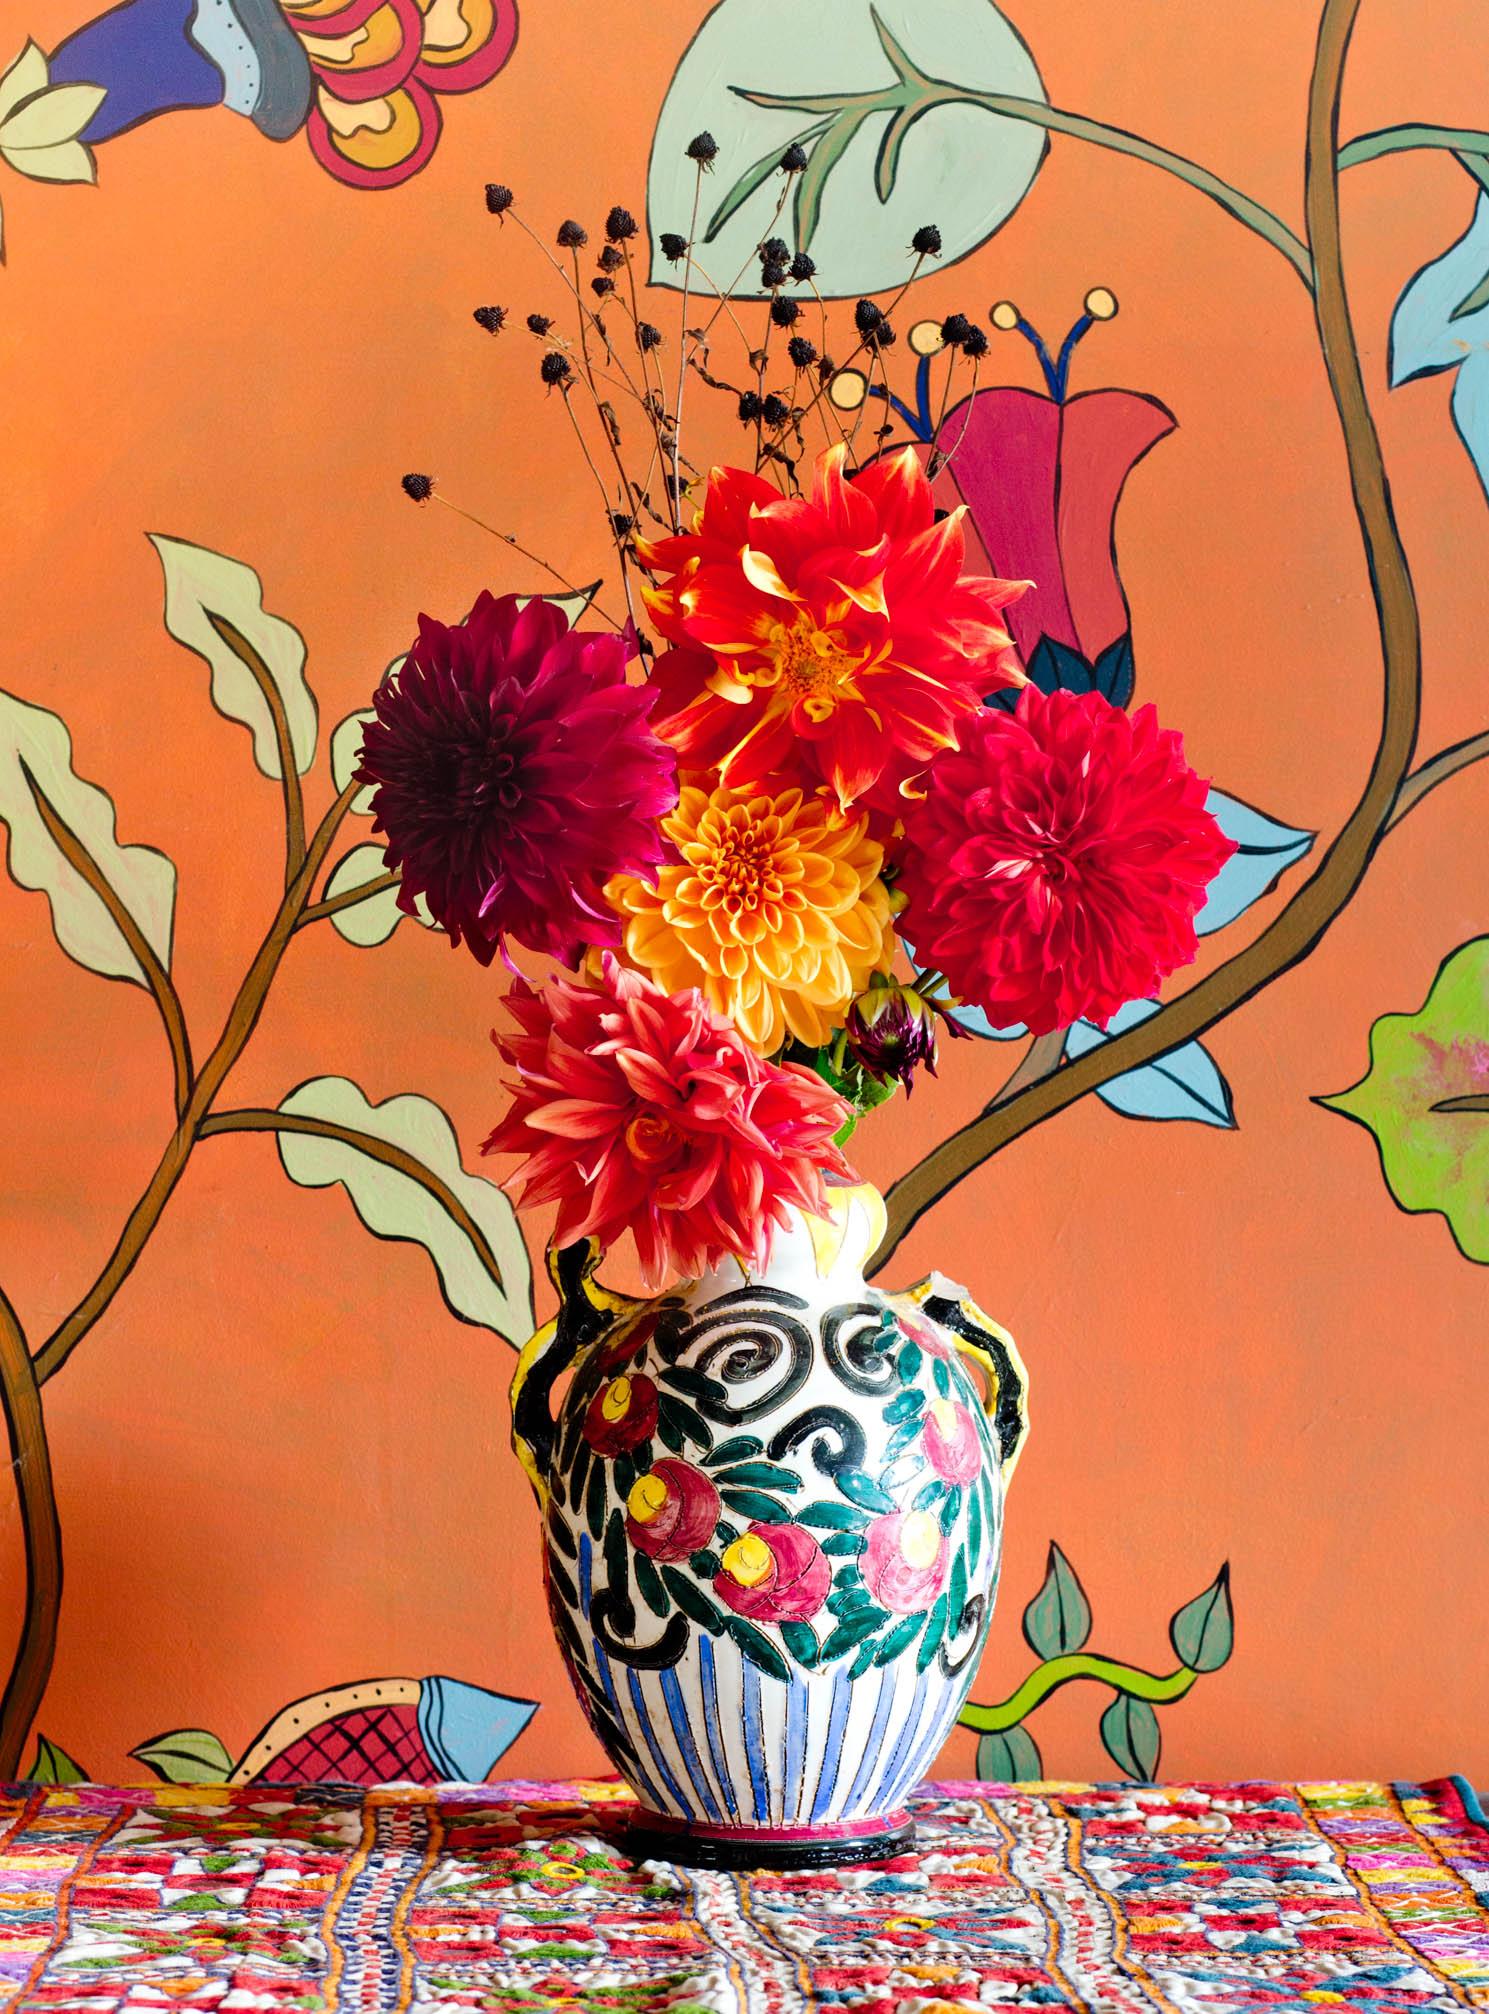 colorful-wallpaper-dahlia-flowers-pattern.jpg